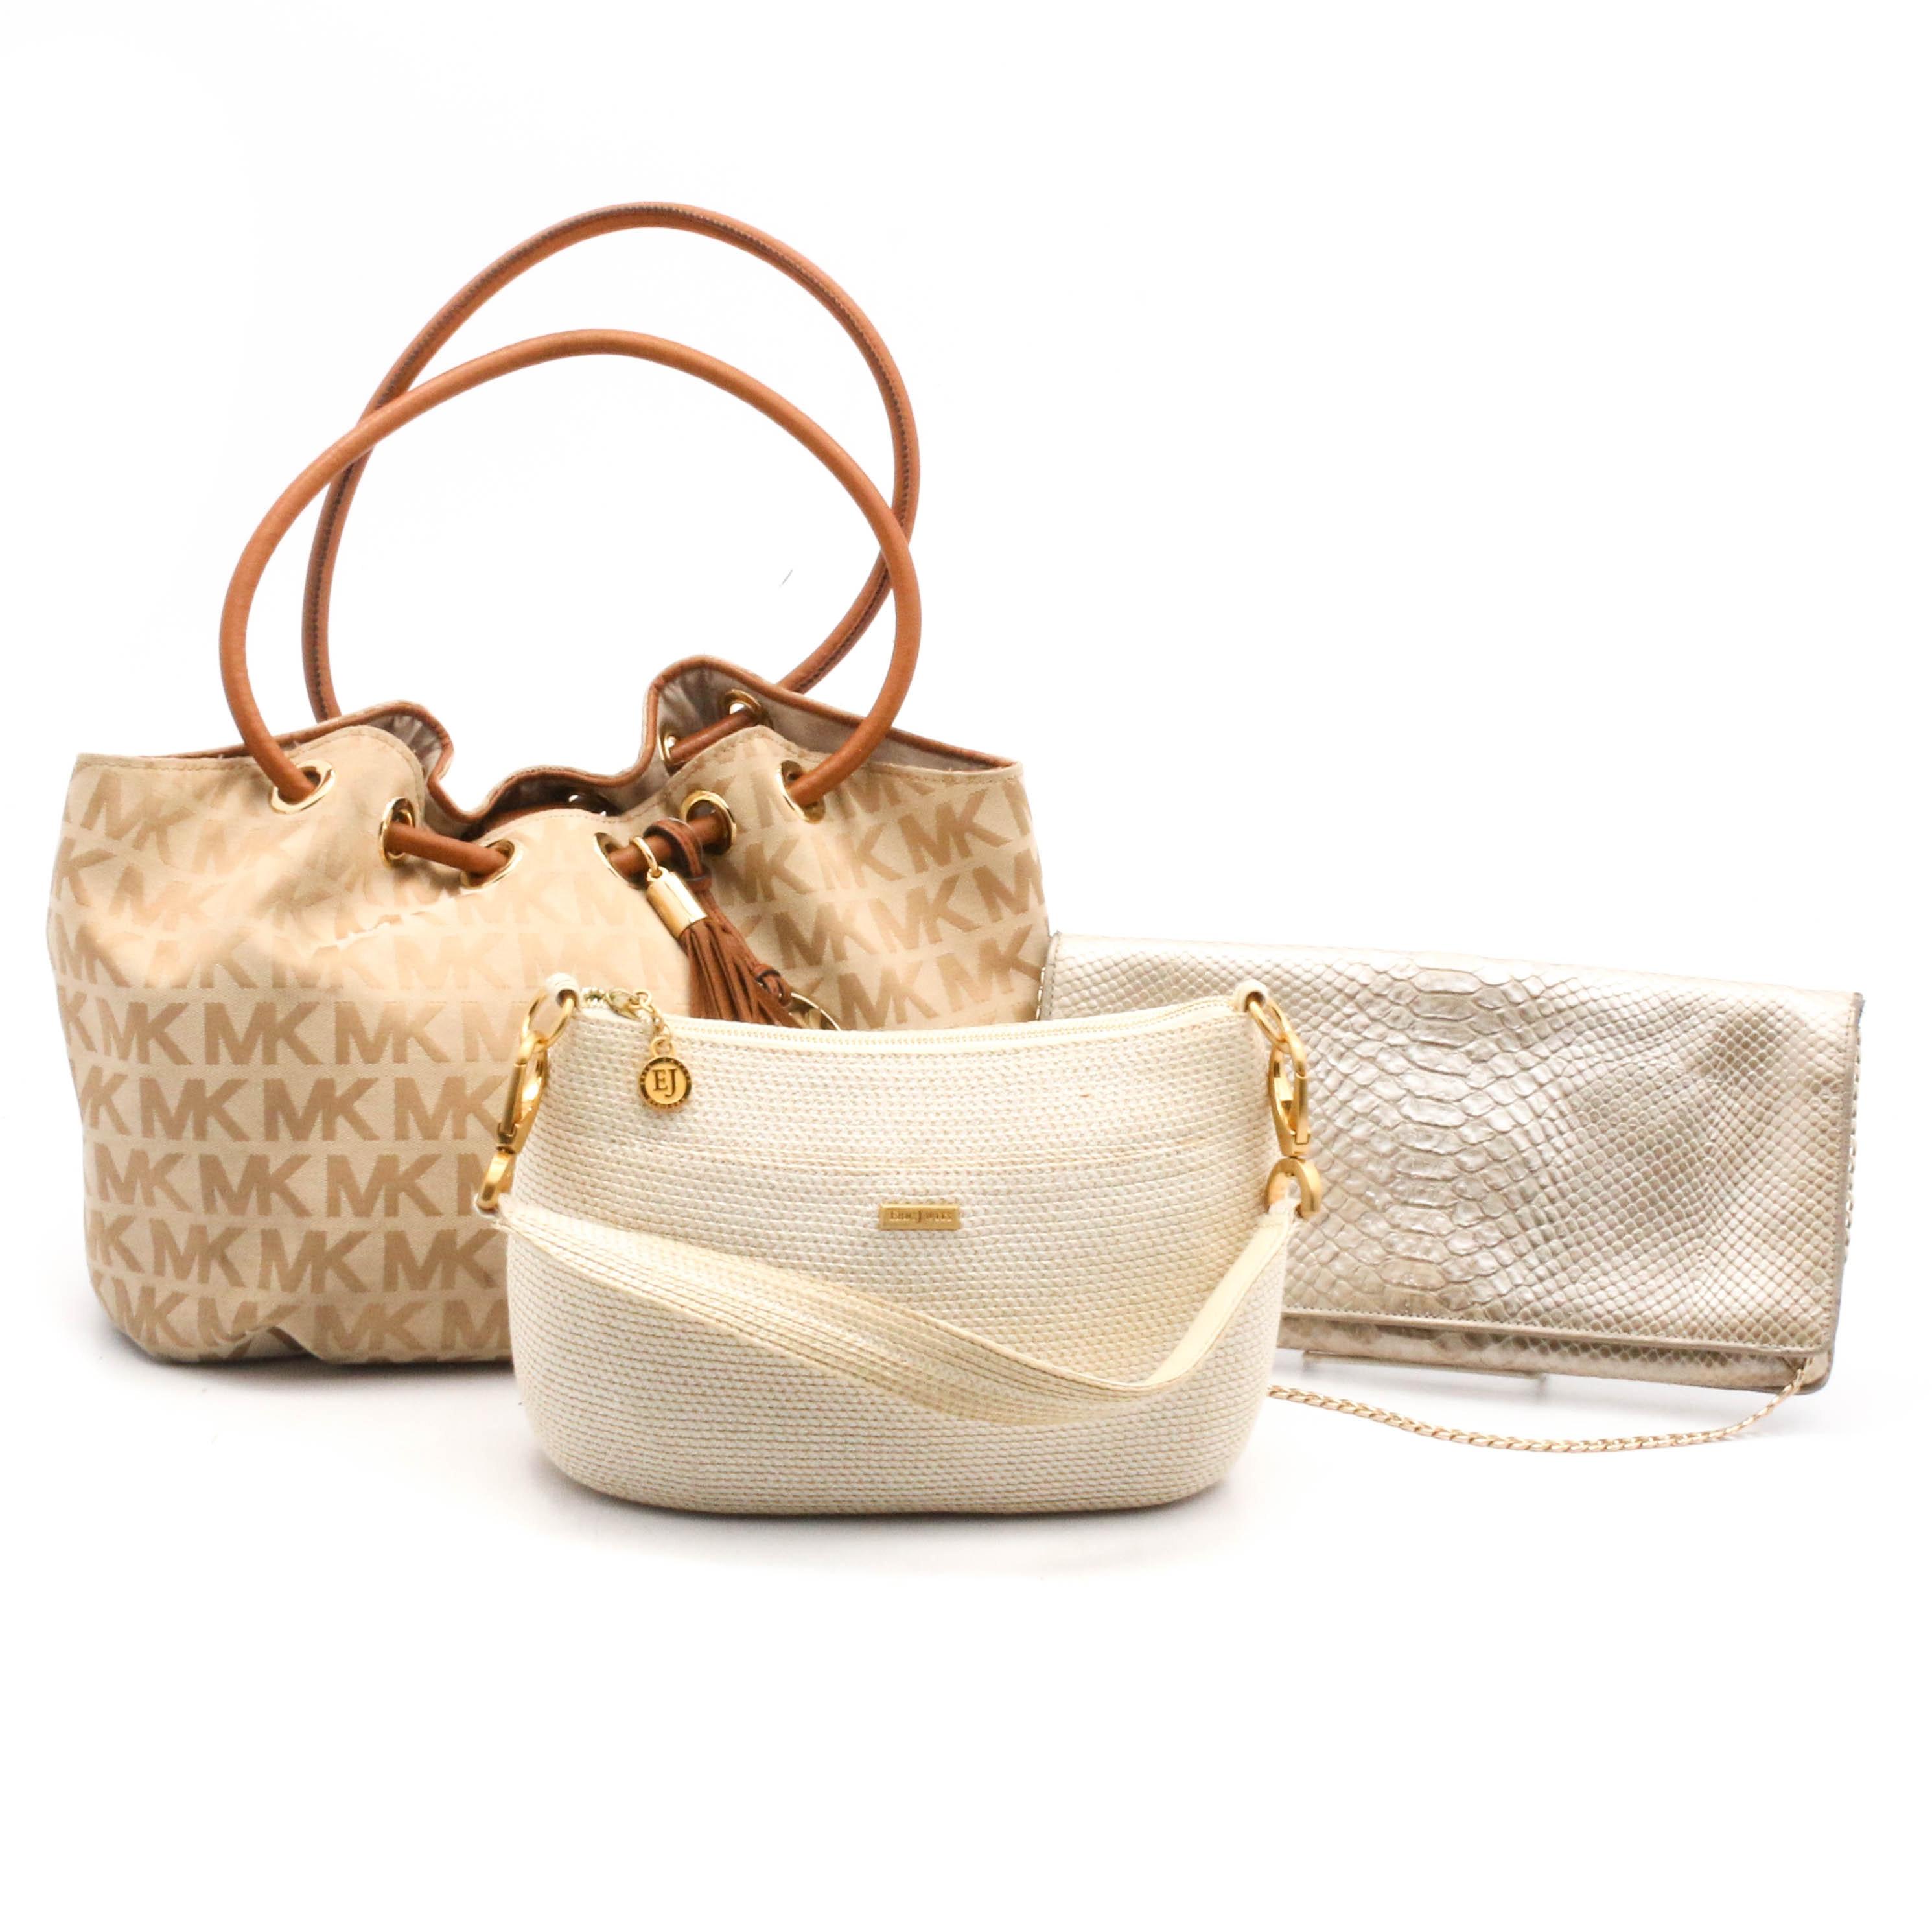 Eric Javits and MICHAEL Michael Kors Handbags